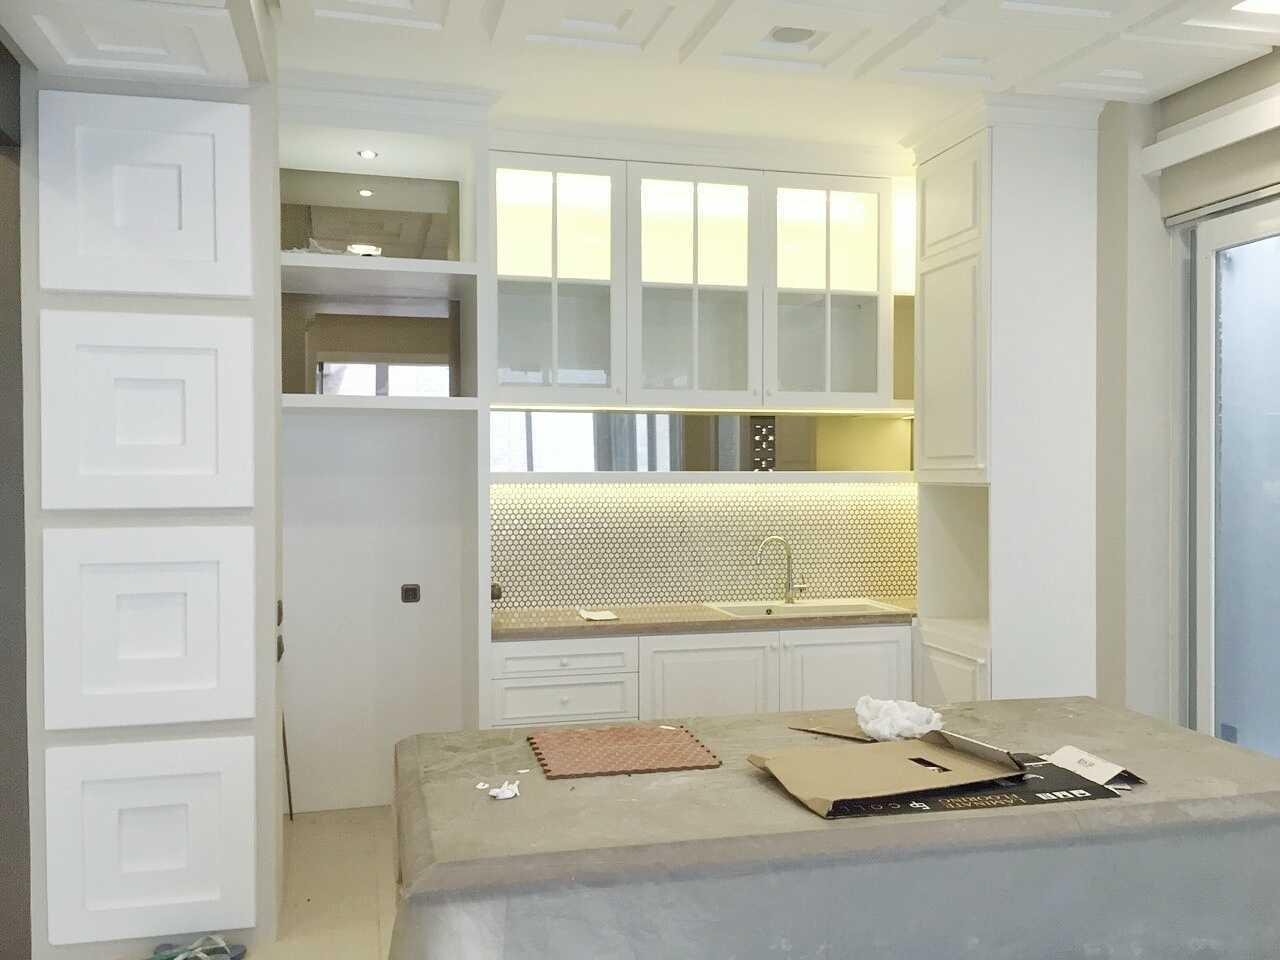 Foto inspirasi ide desain dapur klasik Kitchen area oleh 7Design Architect di Arsitag